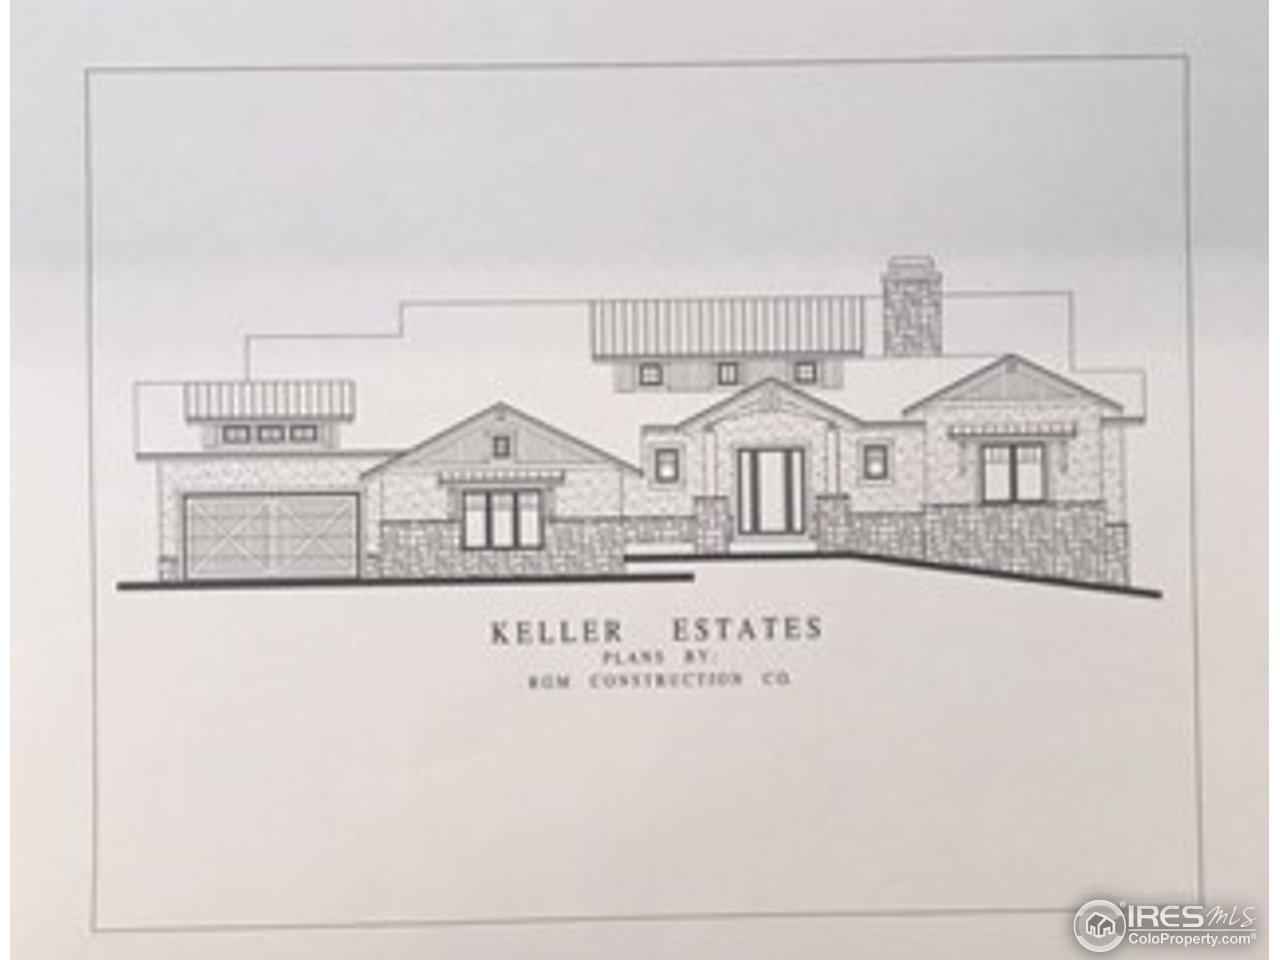 17810 Keller Dr, Berthoud, CO 80513